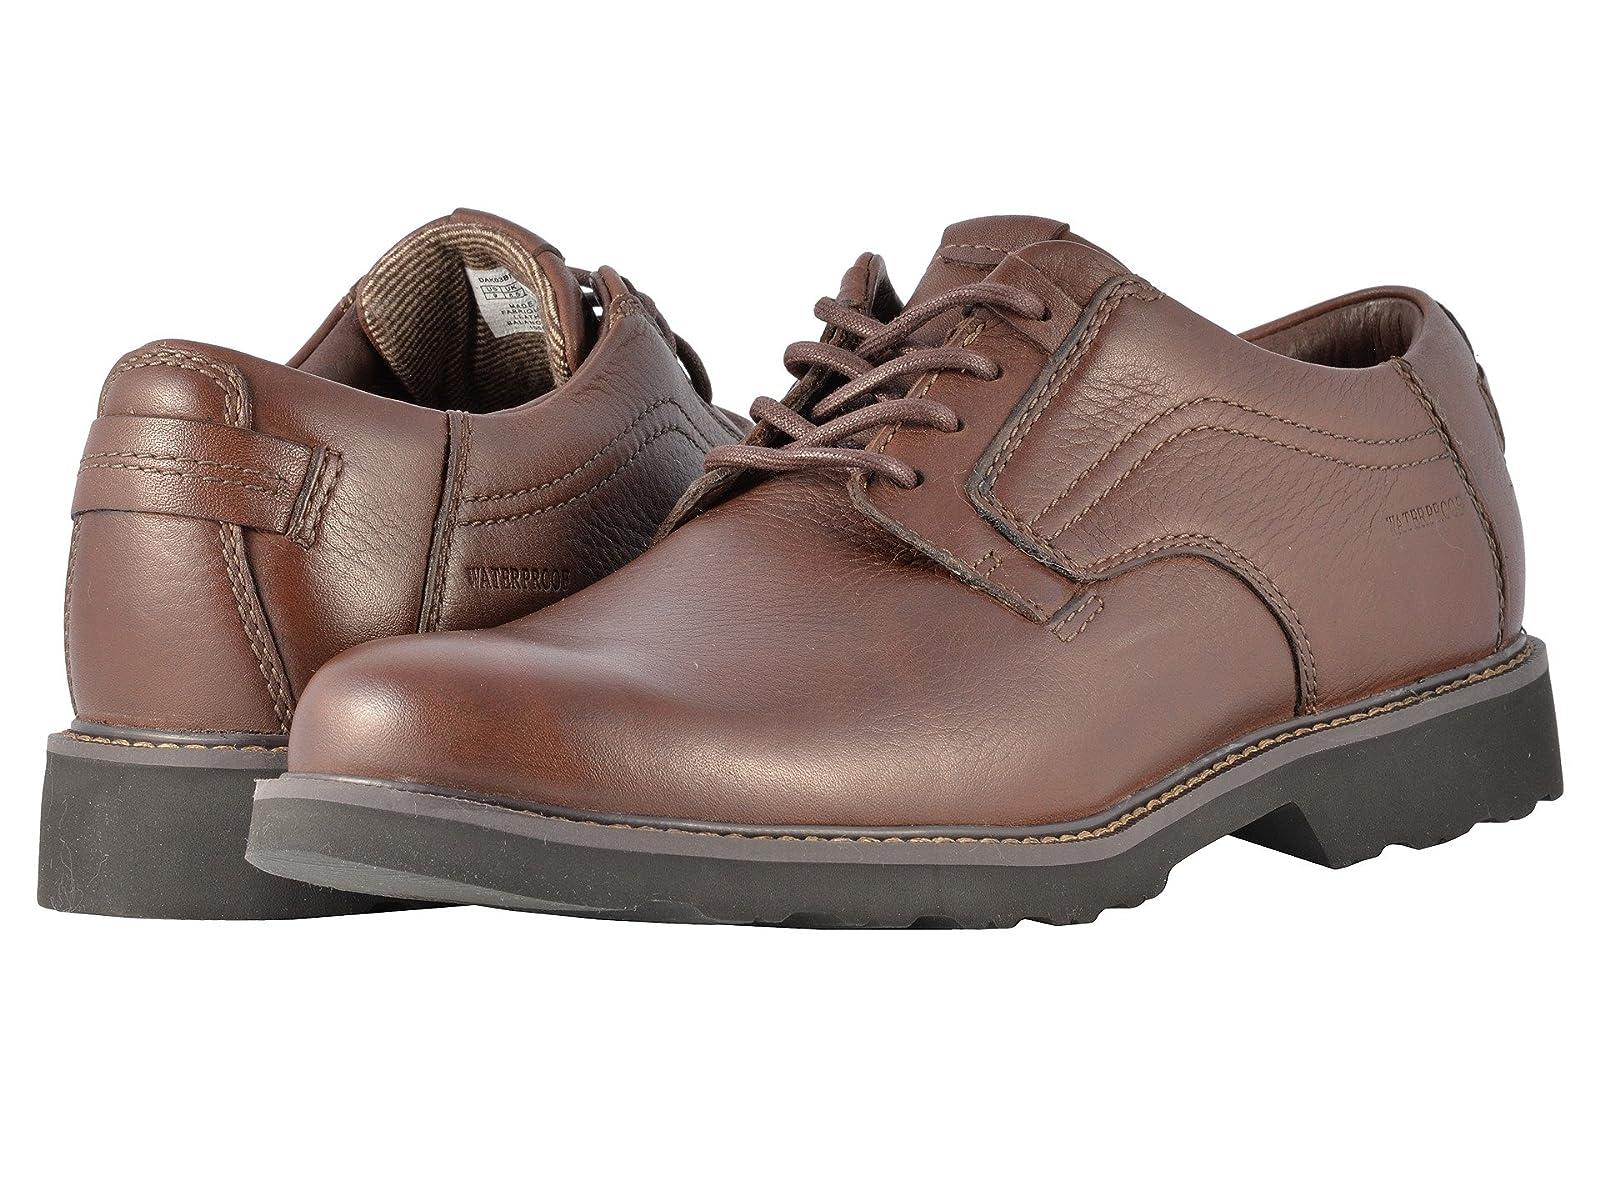 Dunham REVdusk WaterproofCheap and distinctive eye-catching shoes